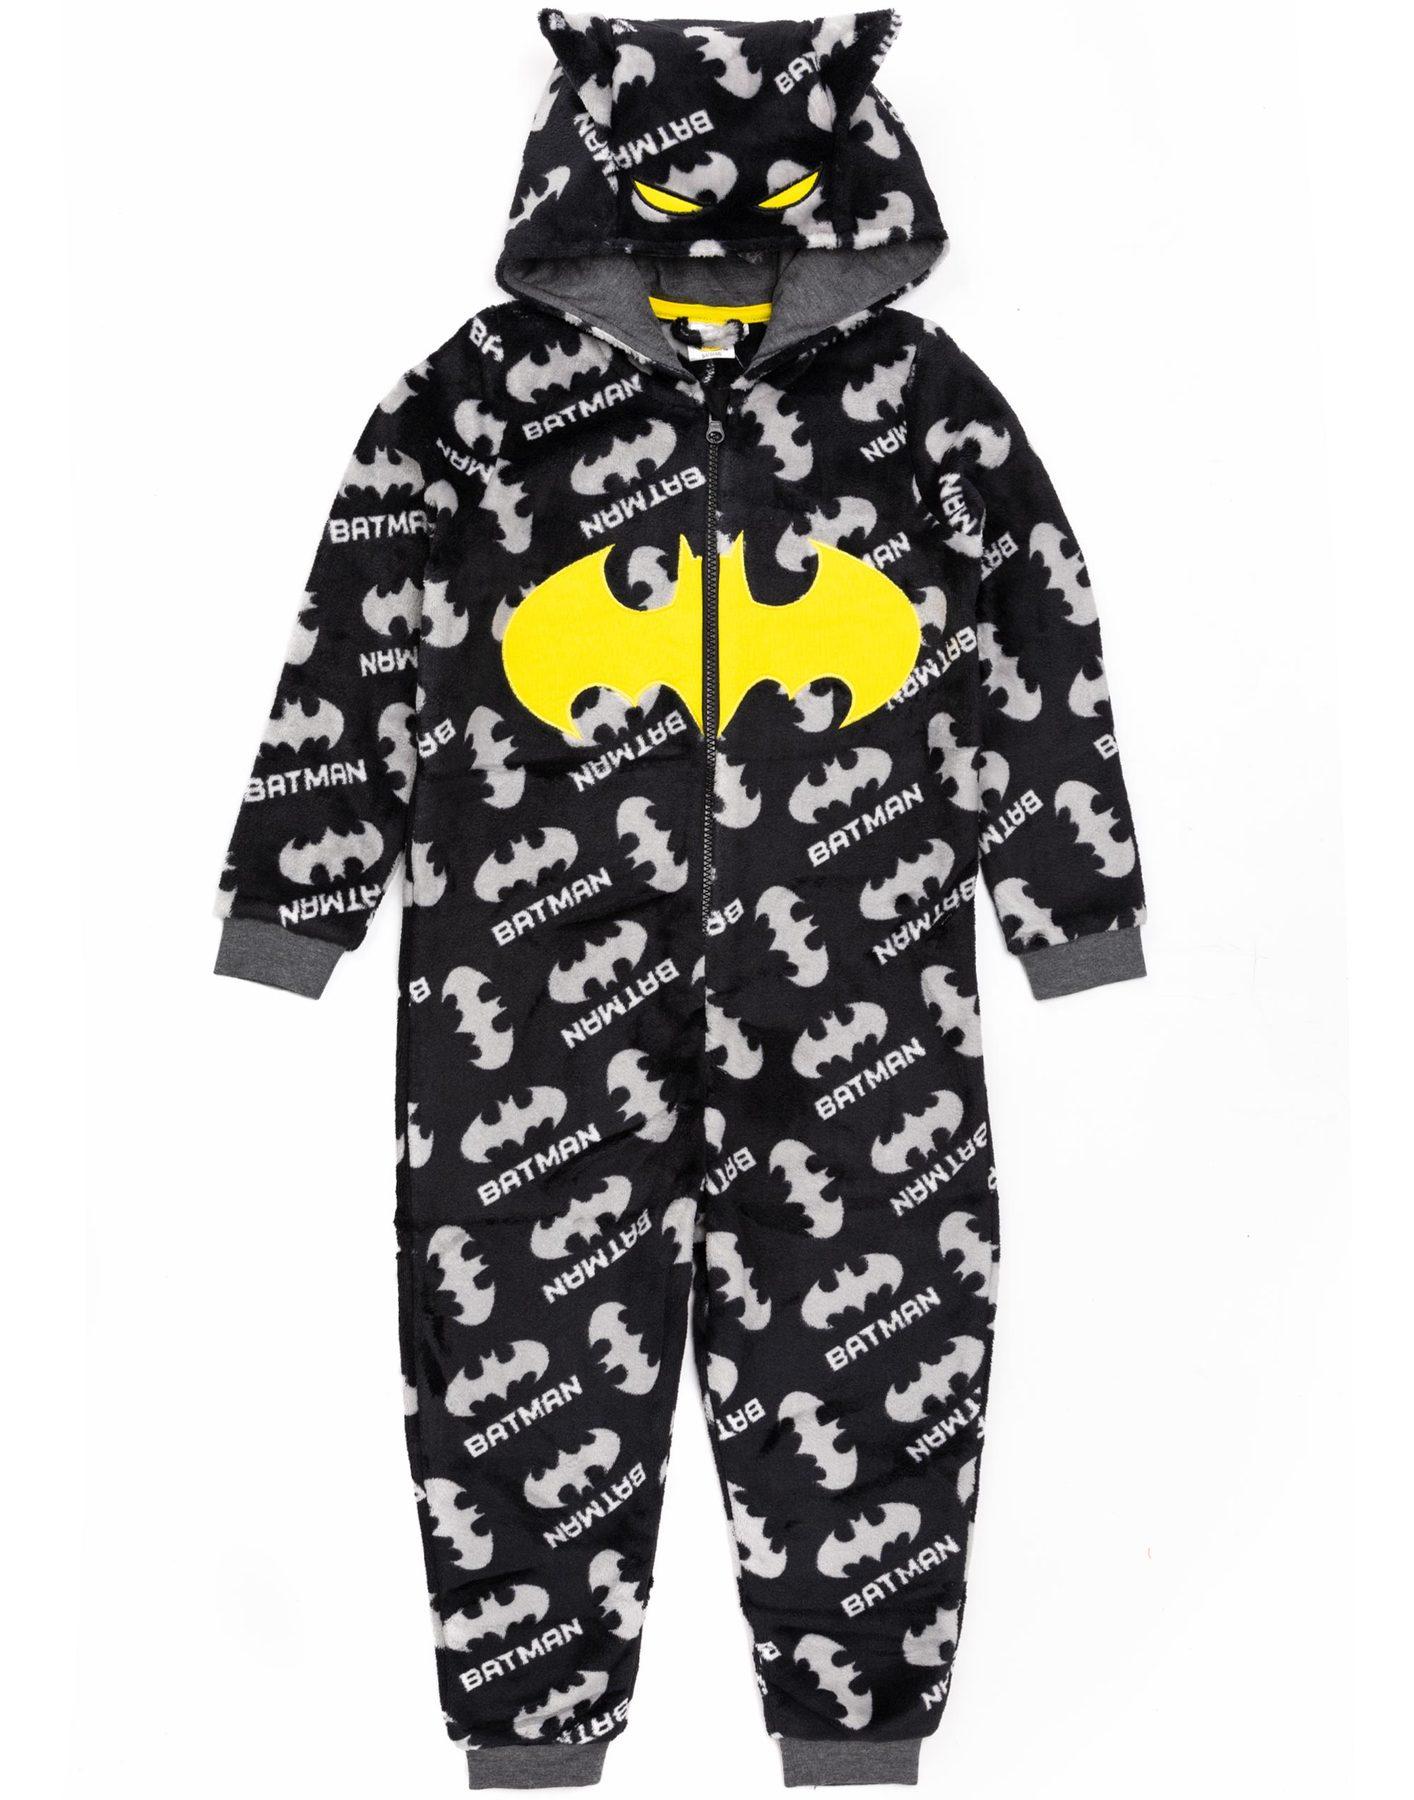 Dc Comics Batman Onesie / Onepiece